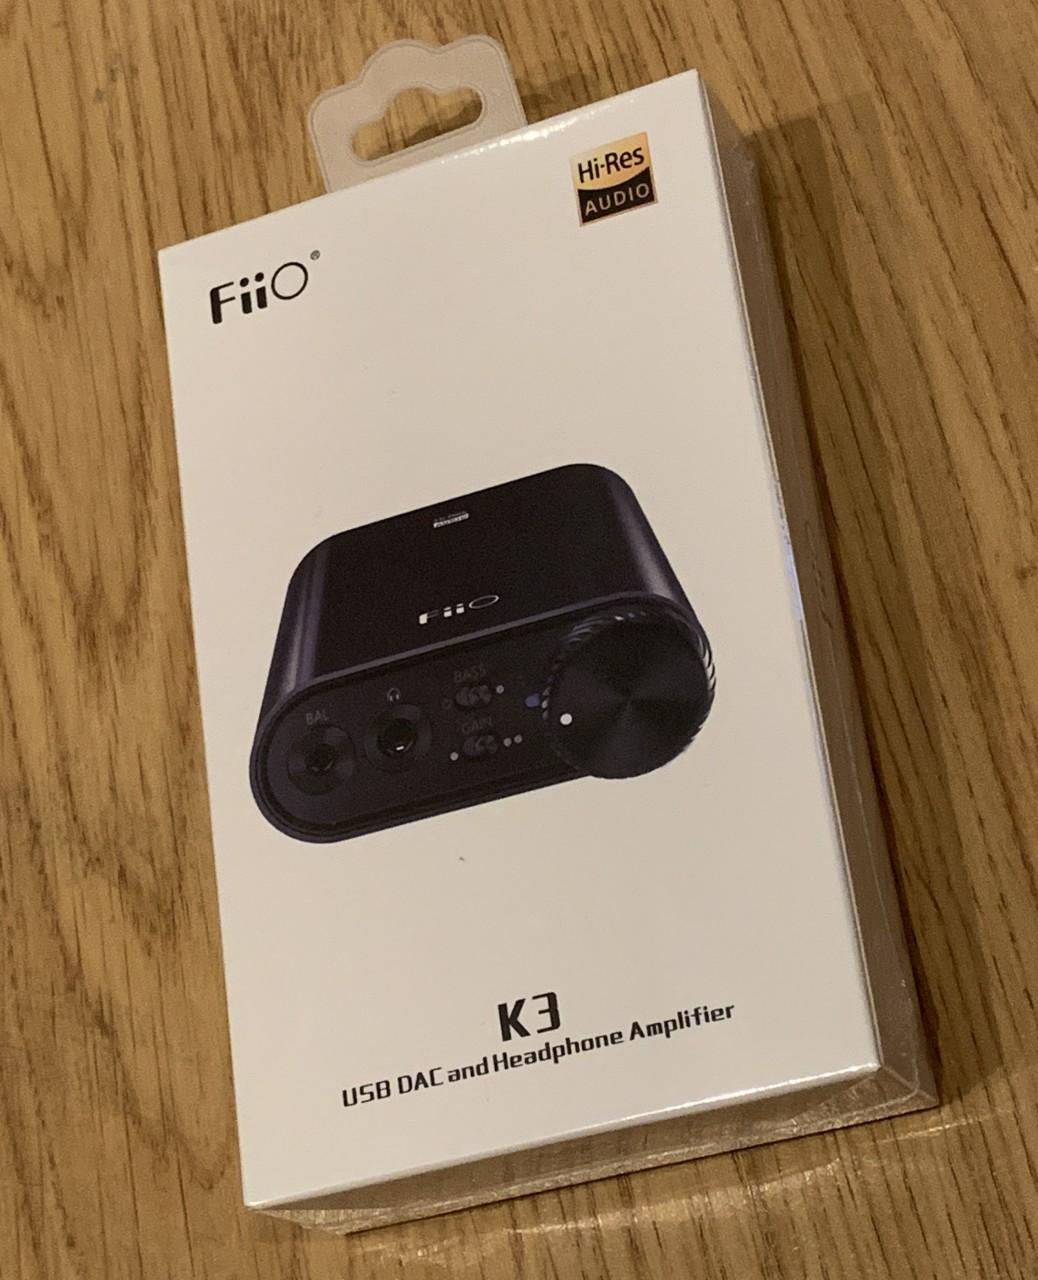 New desktop USB DAC& - FiiO K3 (E30),384K/32b,DSD DOP,typeC